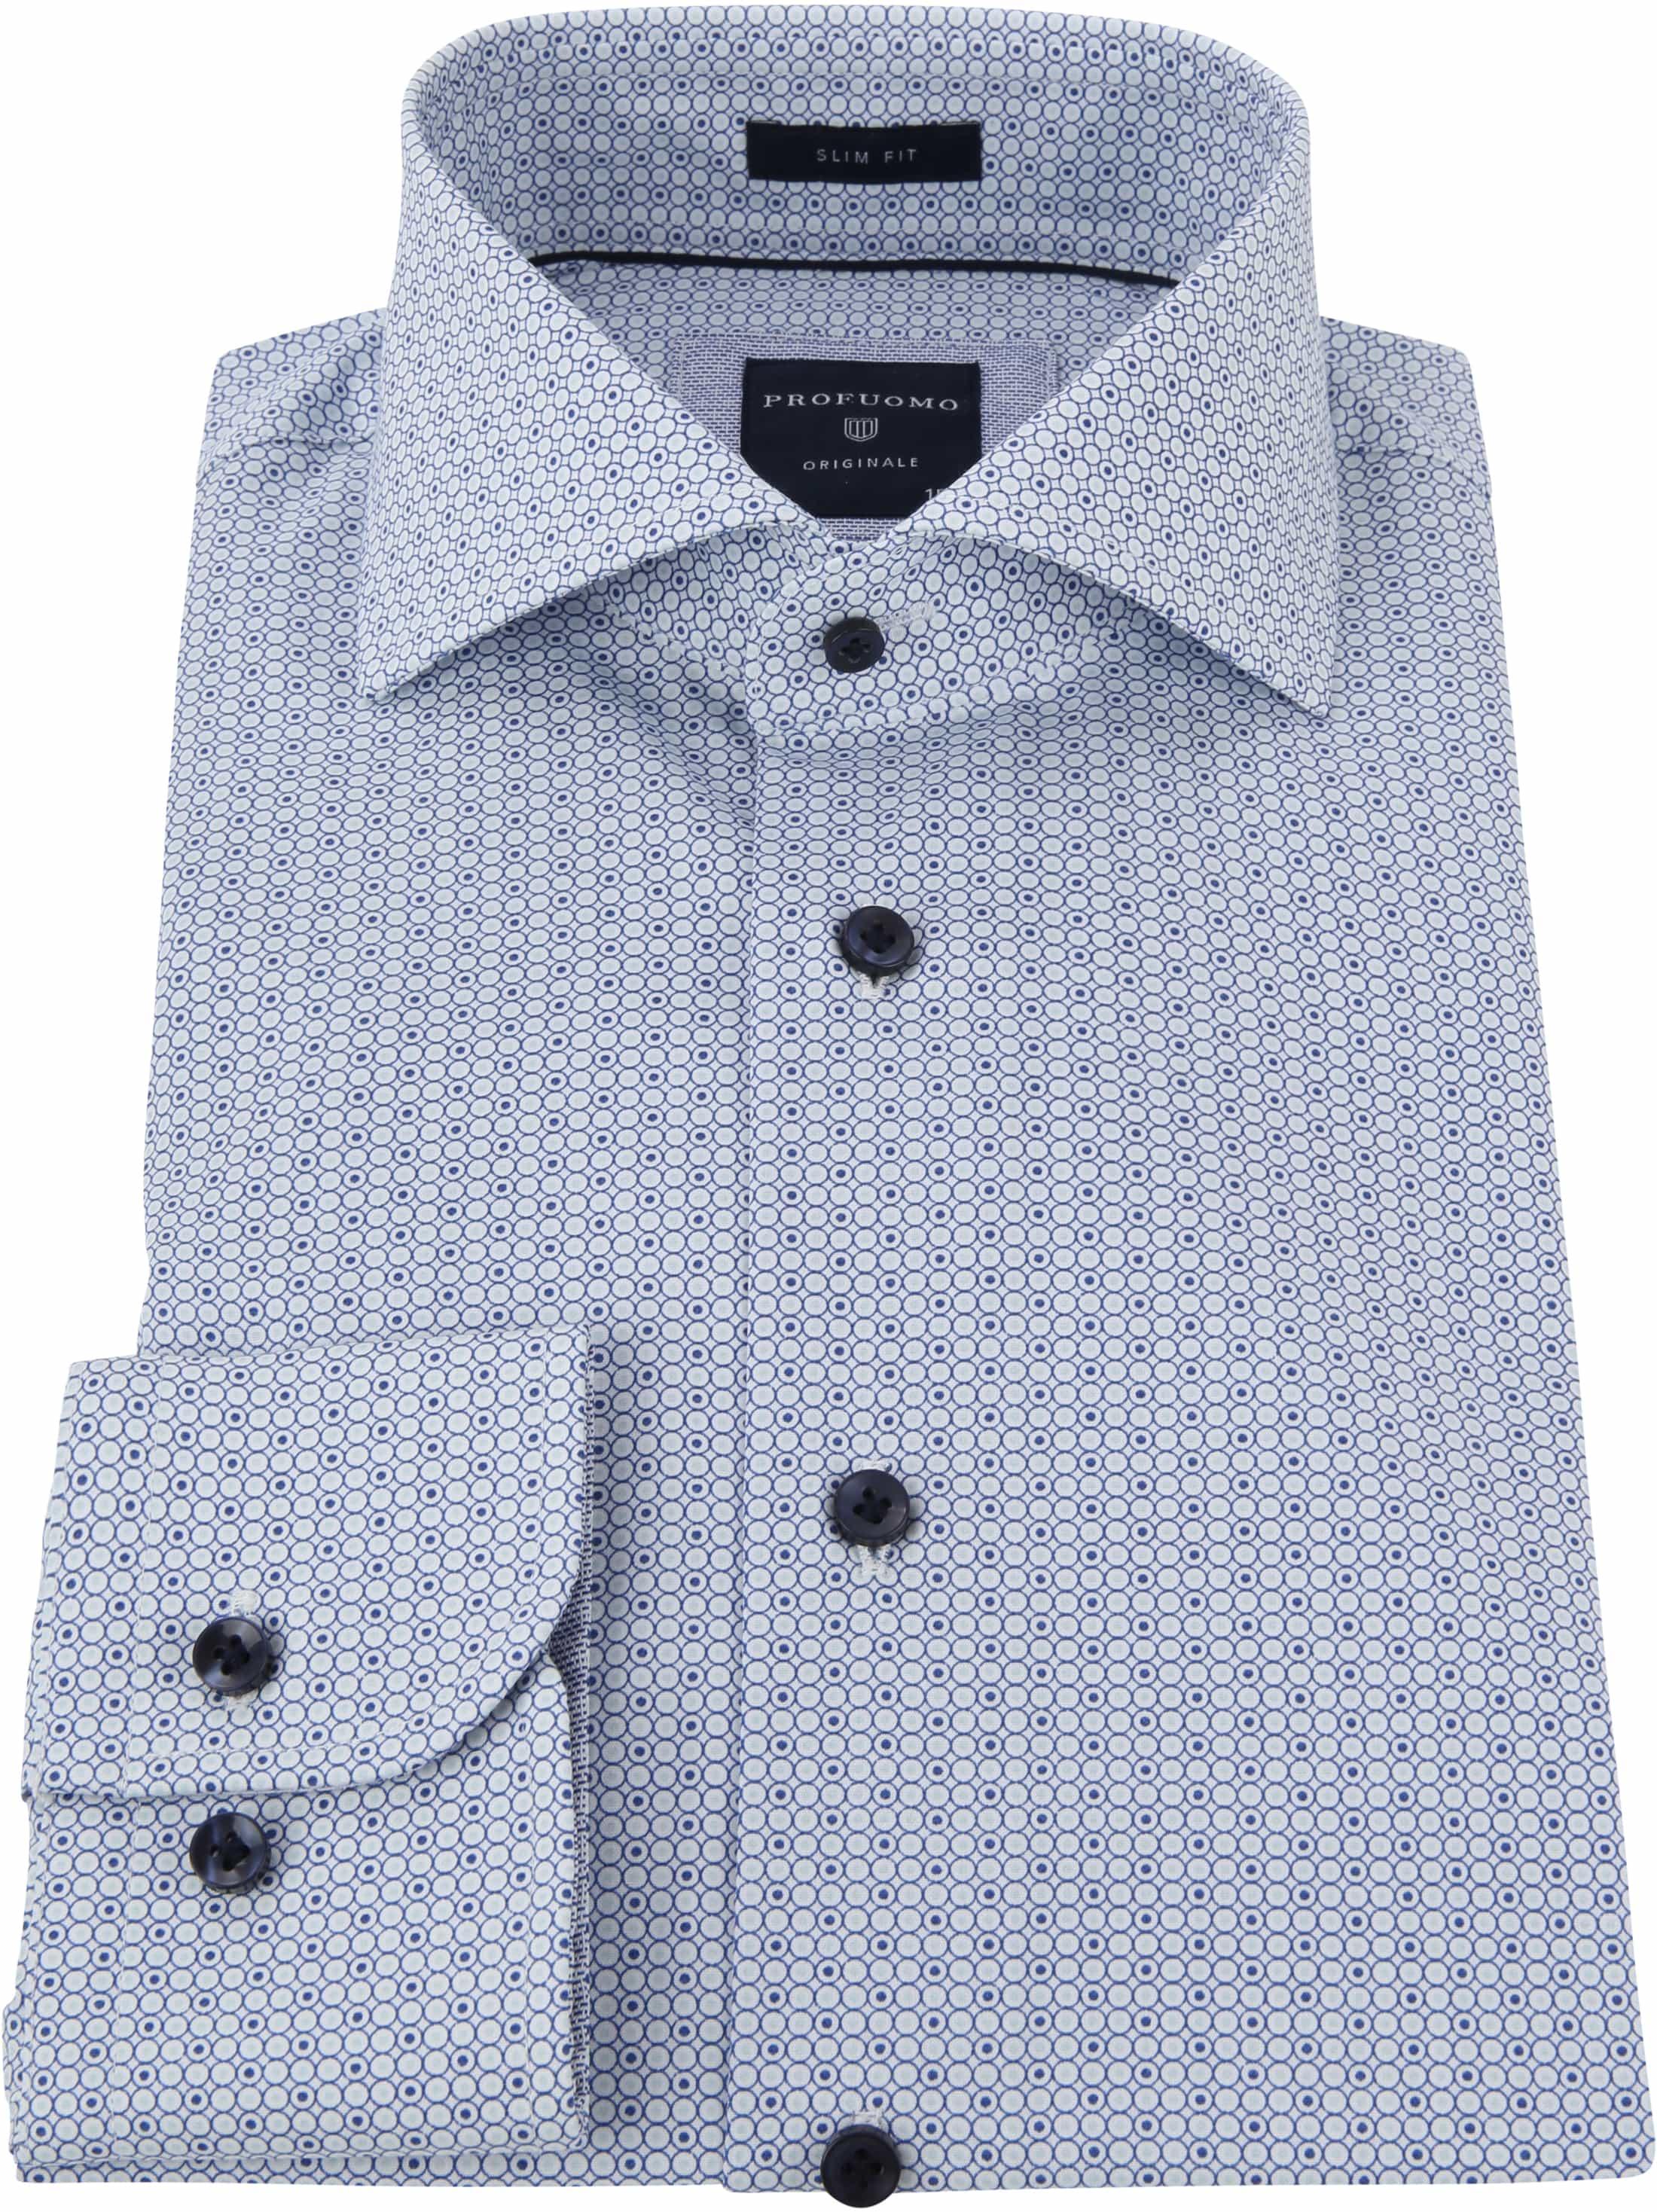 Profuomo Shirt Printed Blue foto 3